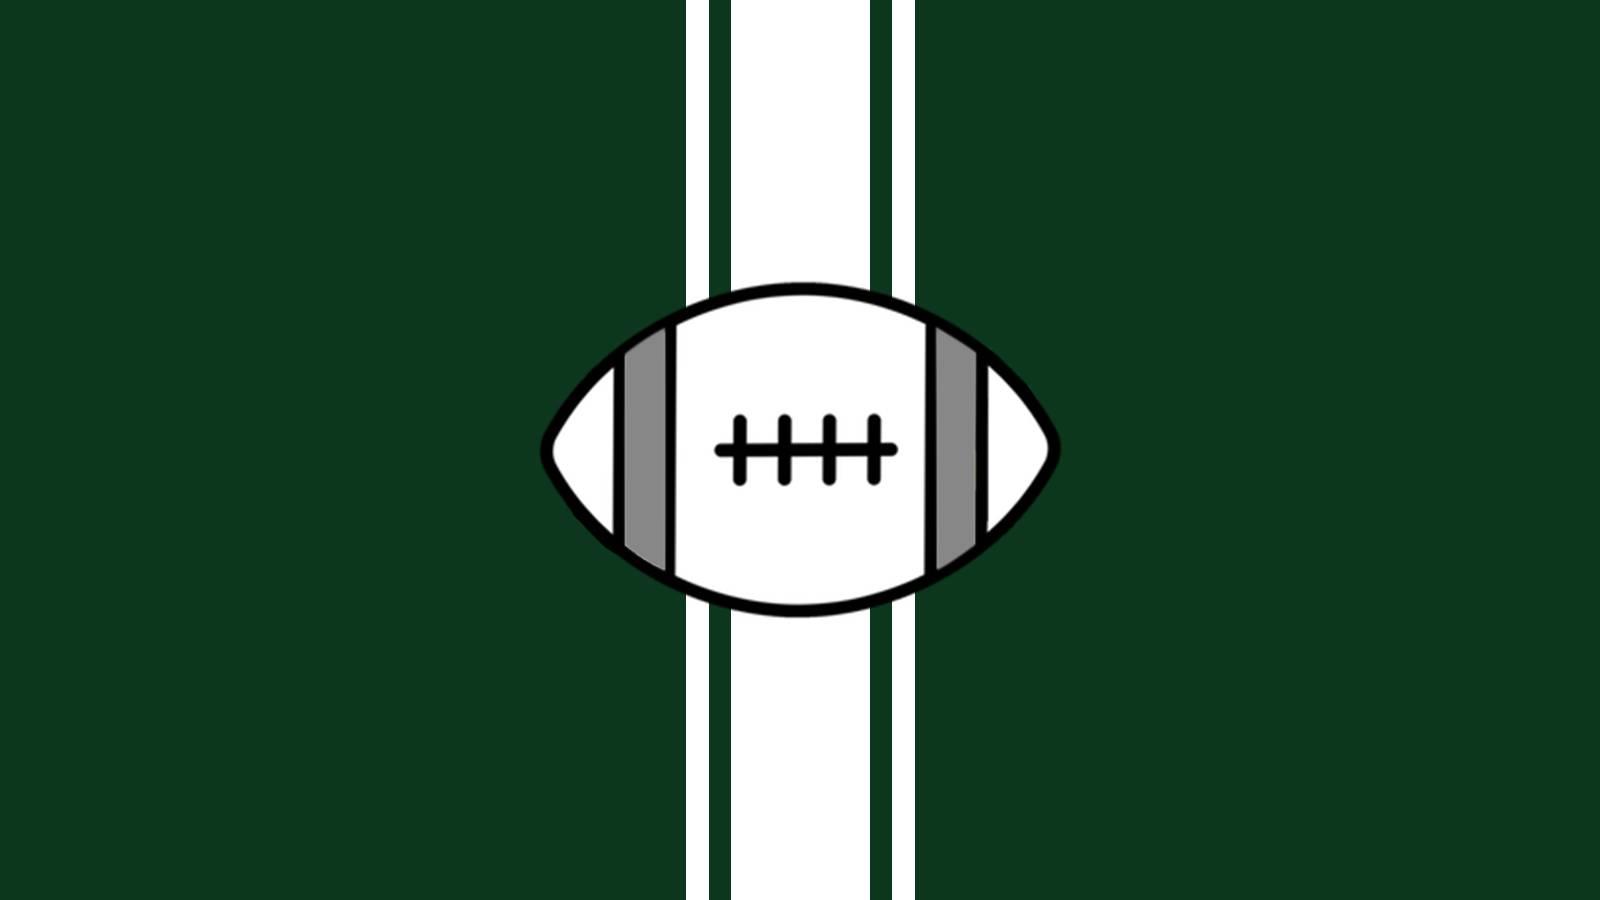 NFL Preseason - Pittsburgh Steelers at New York Jets